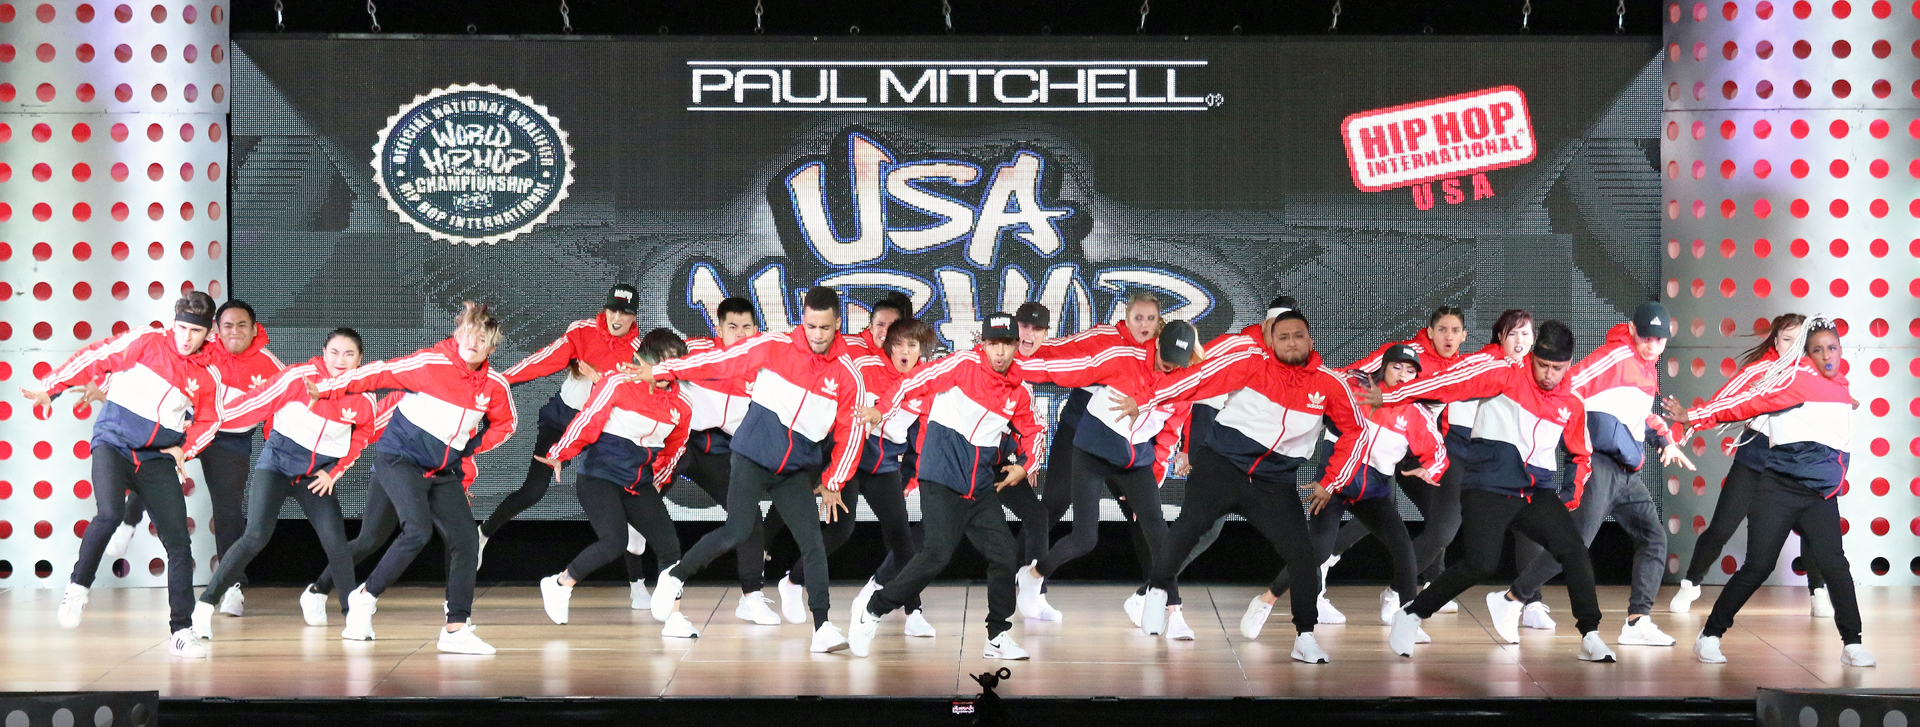 USA Hip Hop Dance Championship | HIP HOP INTERNATIONAL